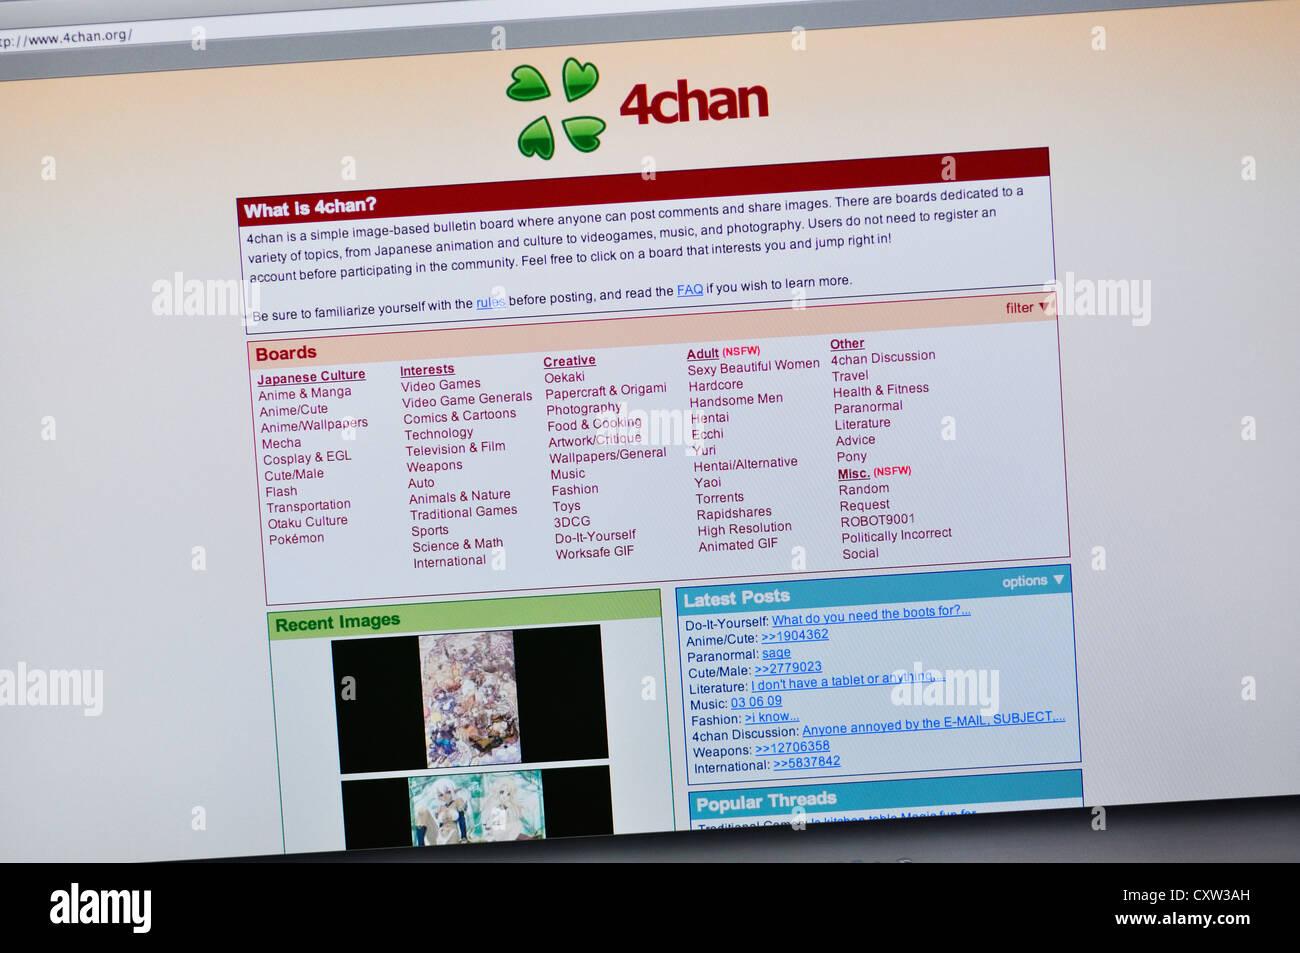 4Chan Gif 4chan website - online bulletin board stock photo - alamy